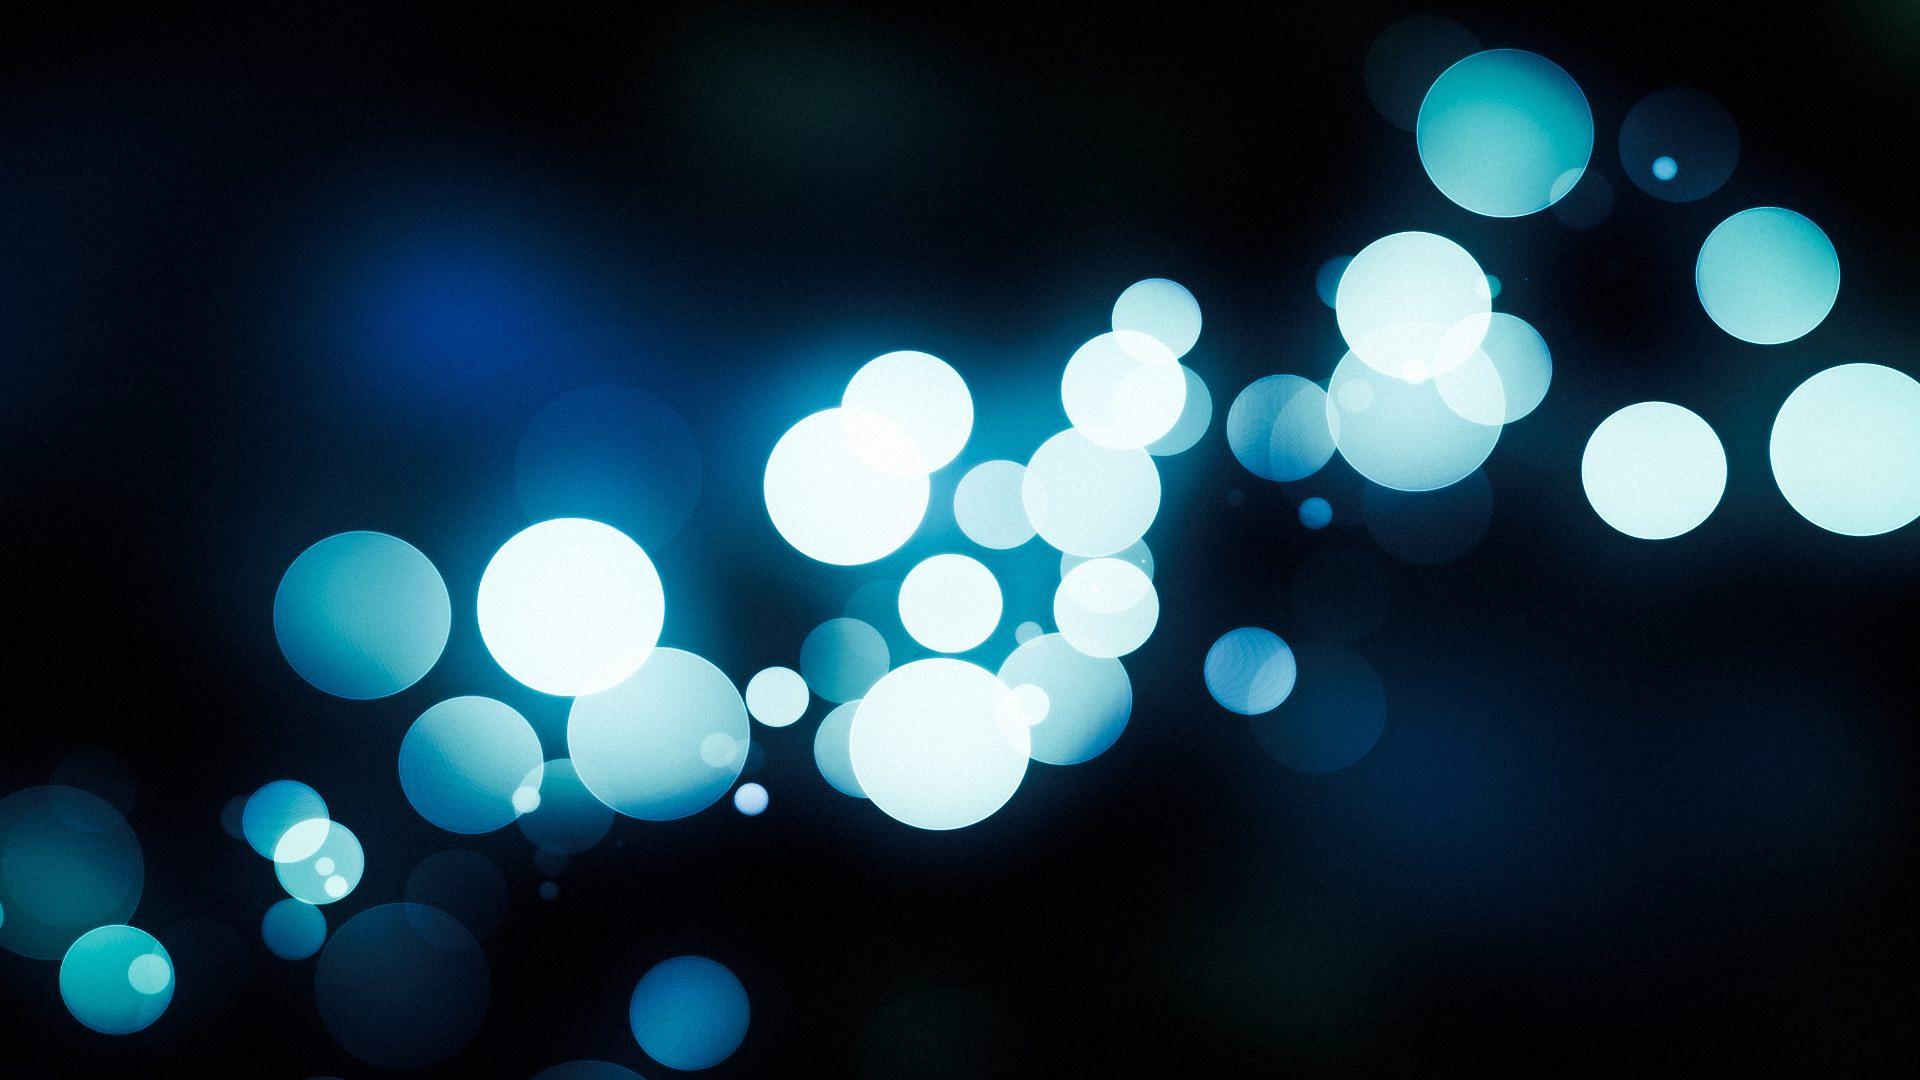 8589130421229-blue-bokeh-lights-wallpaper-hd - denise austin